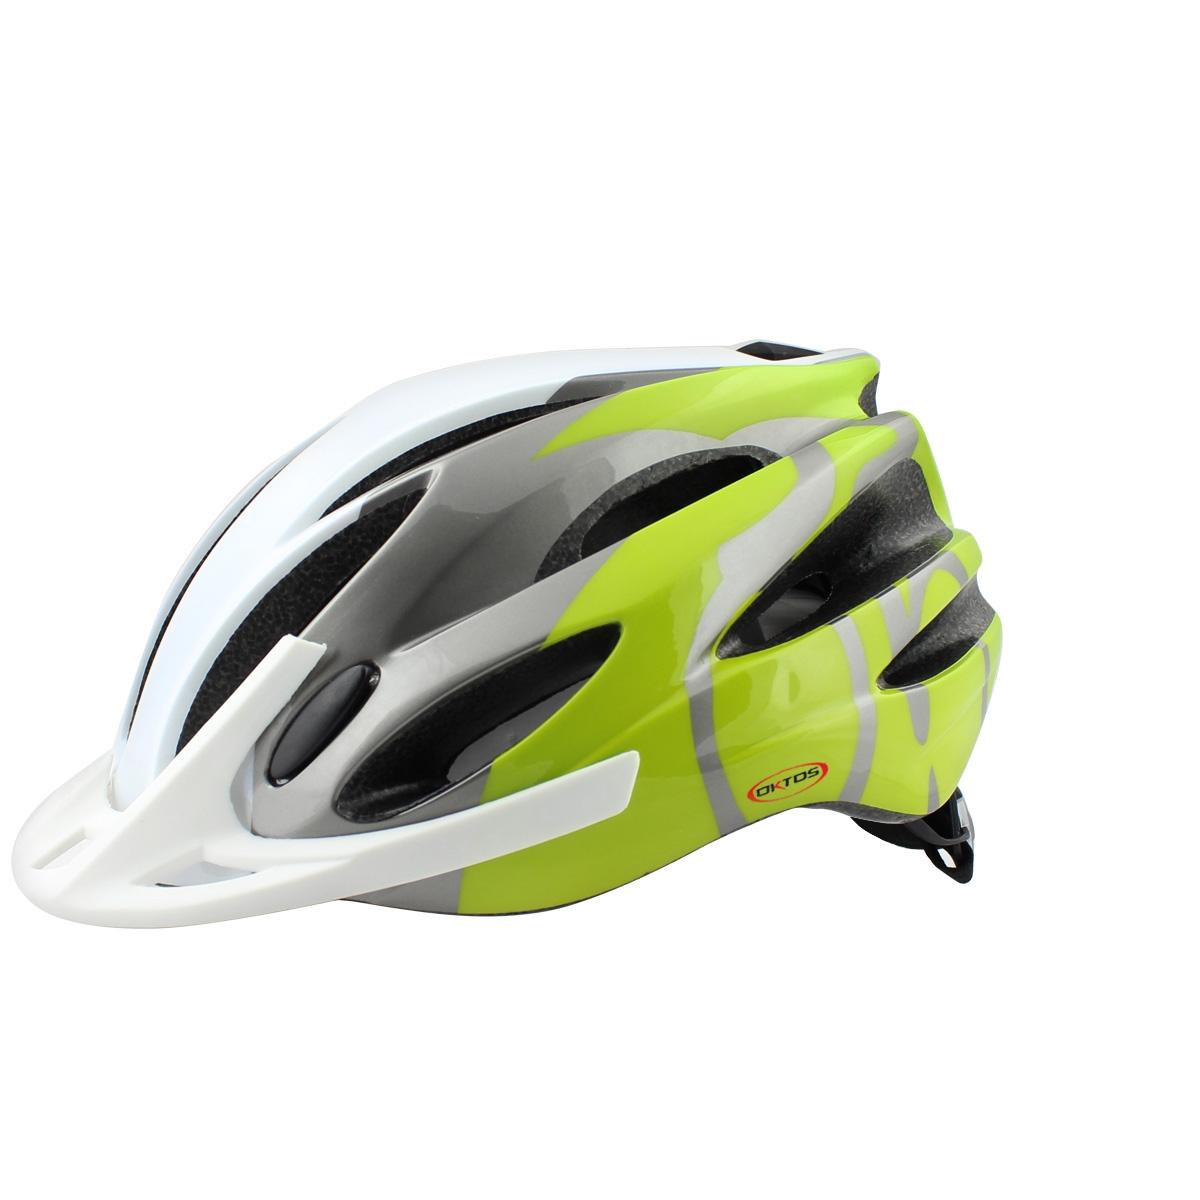 Casque vélo Oktos Vert/Blanc - 54/58 cm